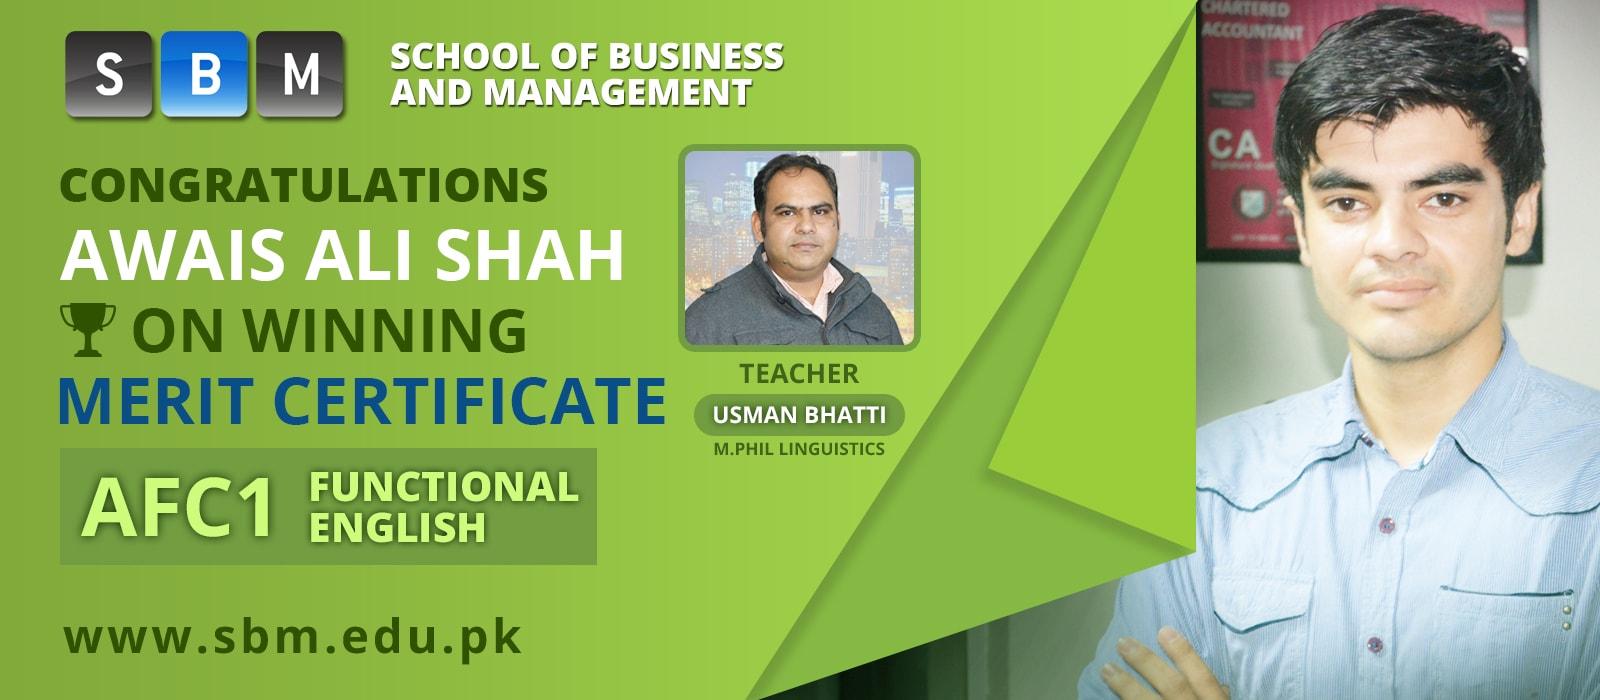 SBM's Student, Awais Ali Shah, Wins Merit Certificate